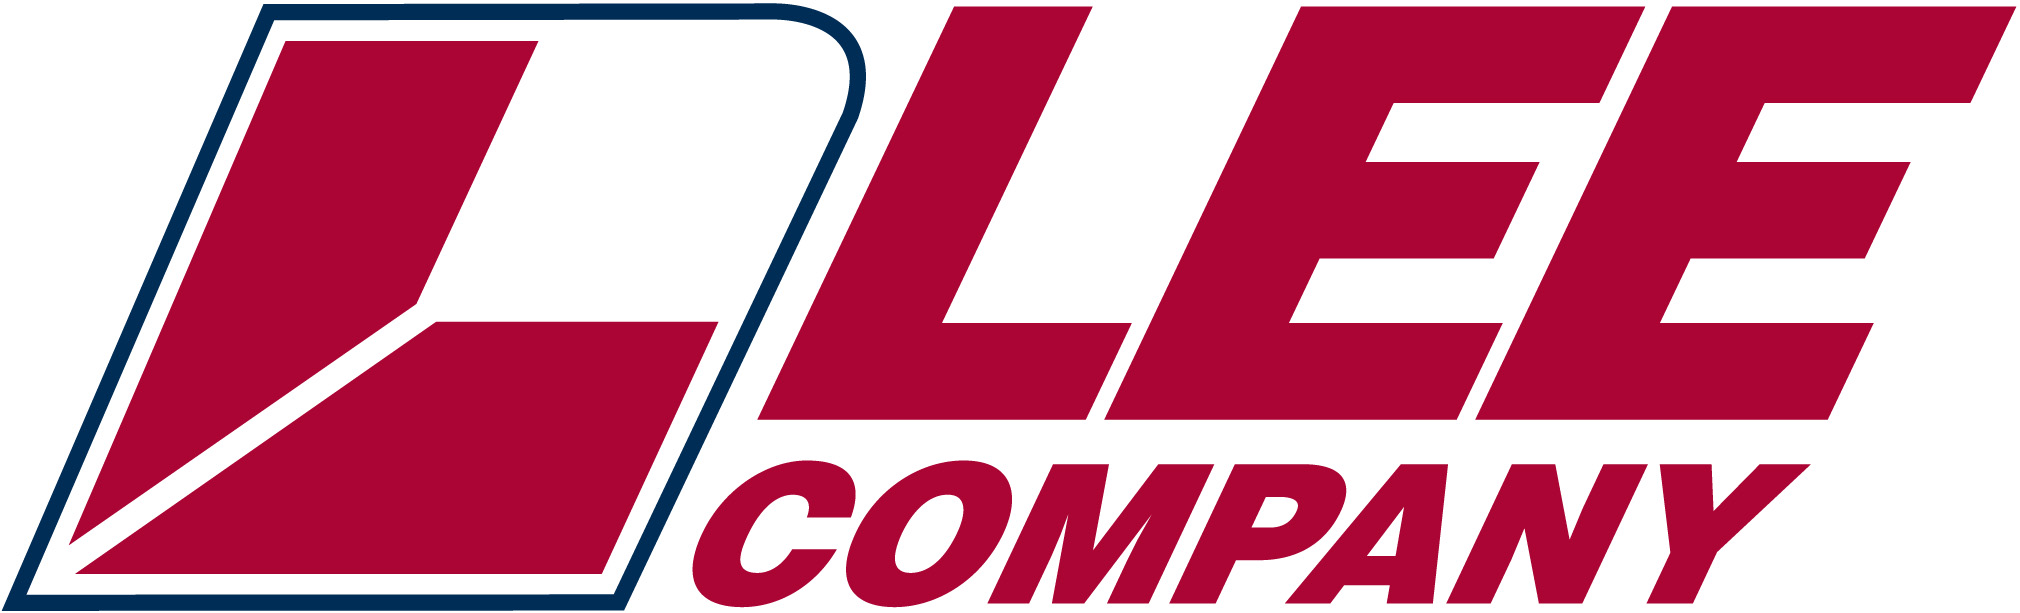 Lee-company-2016.jpg